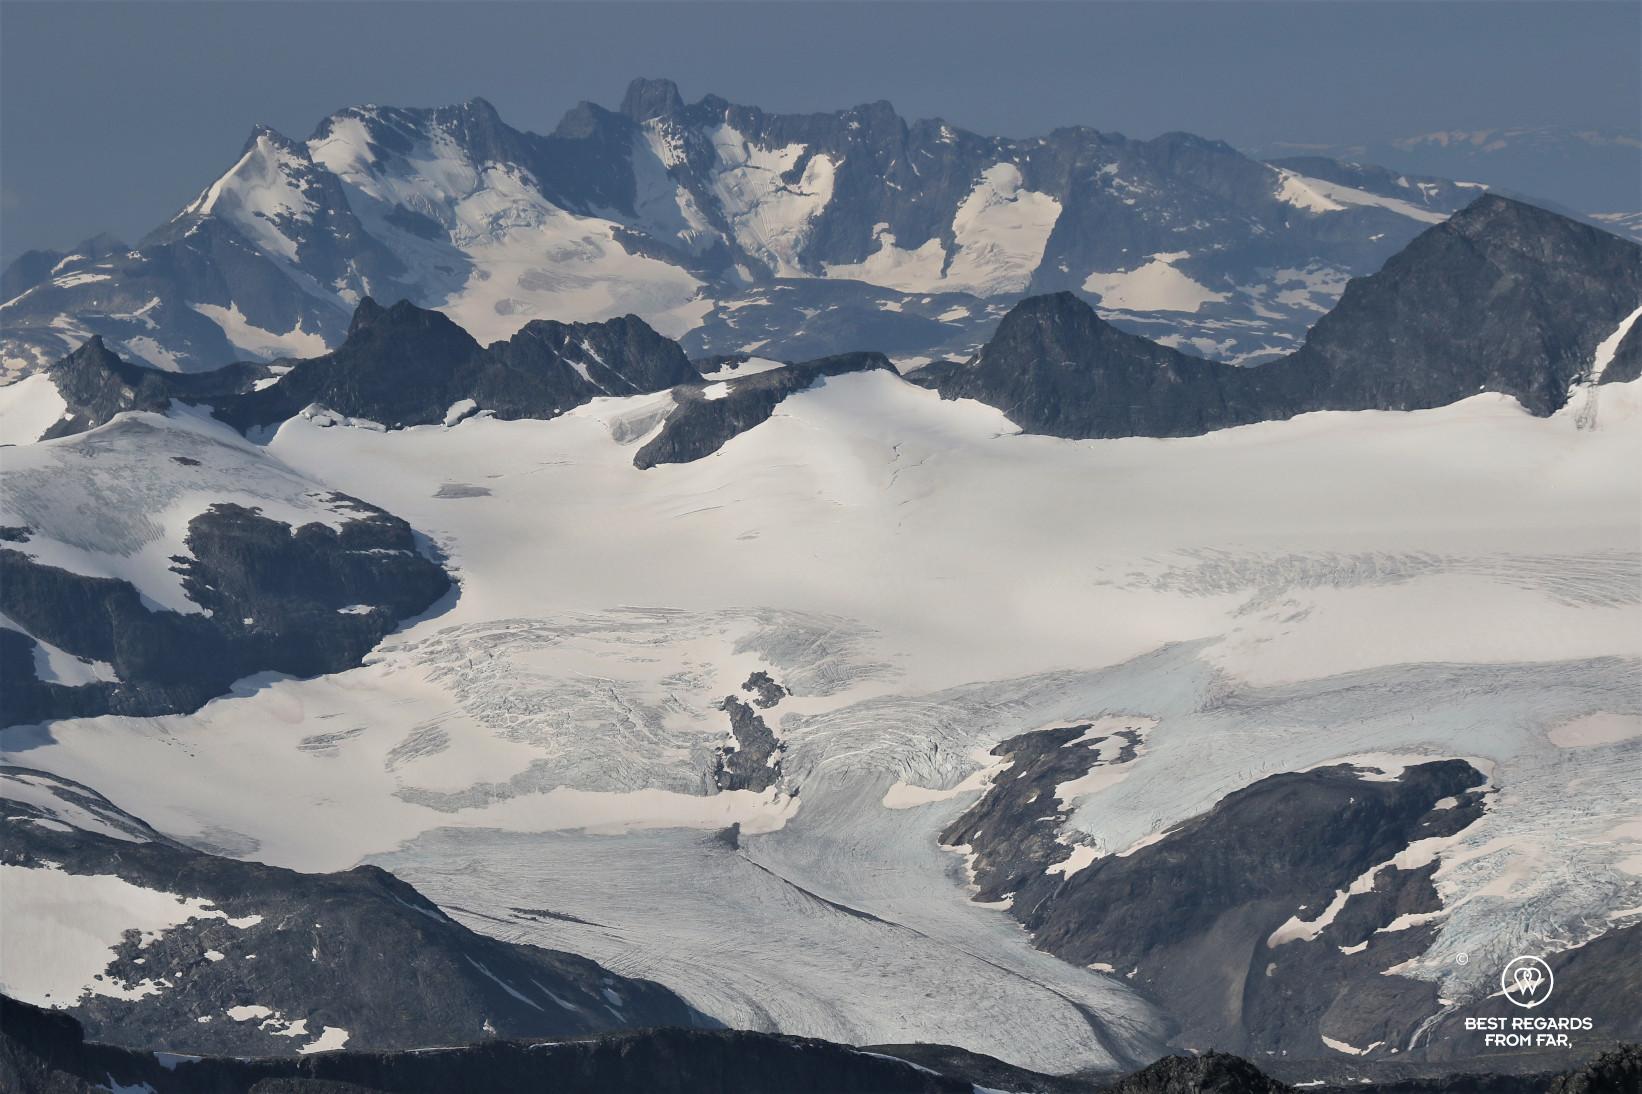 Landscape of glaciers seen from the peak of Galdhøpiggen, Norway's highest